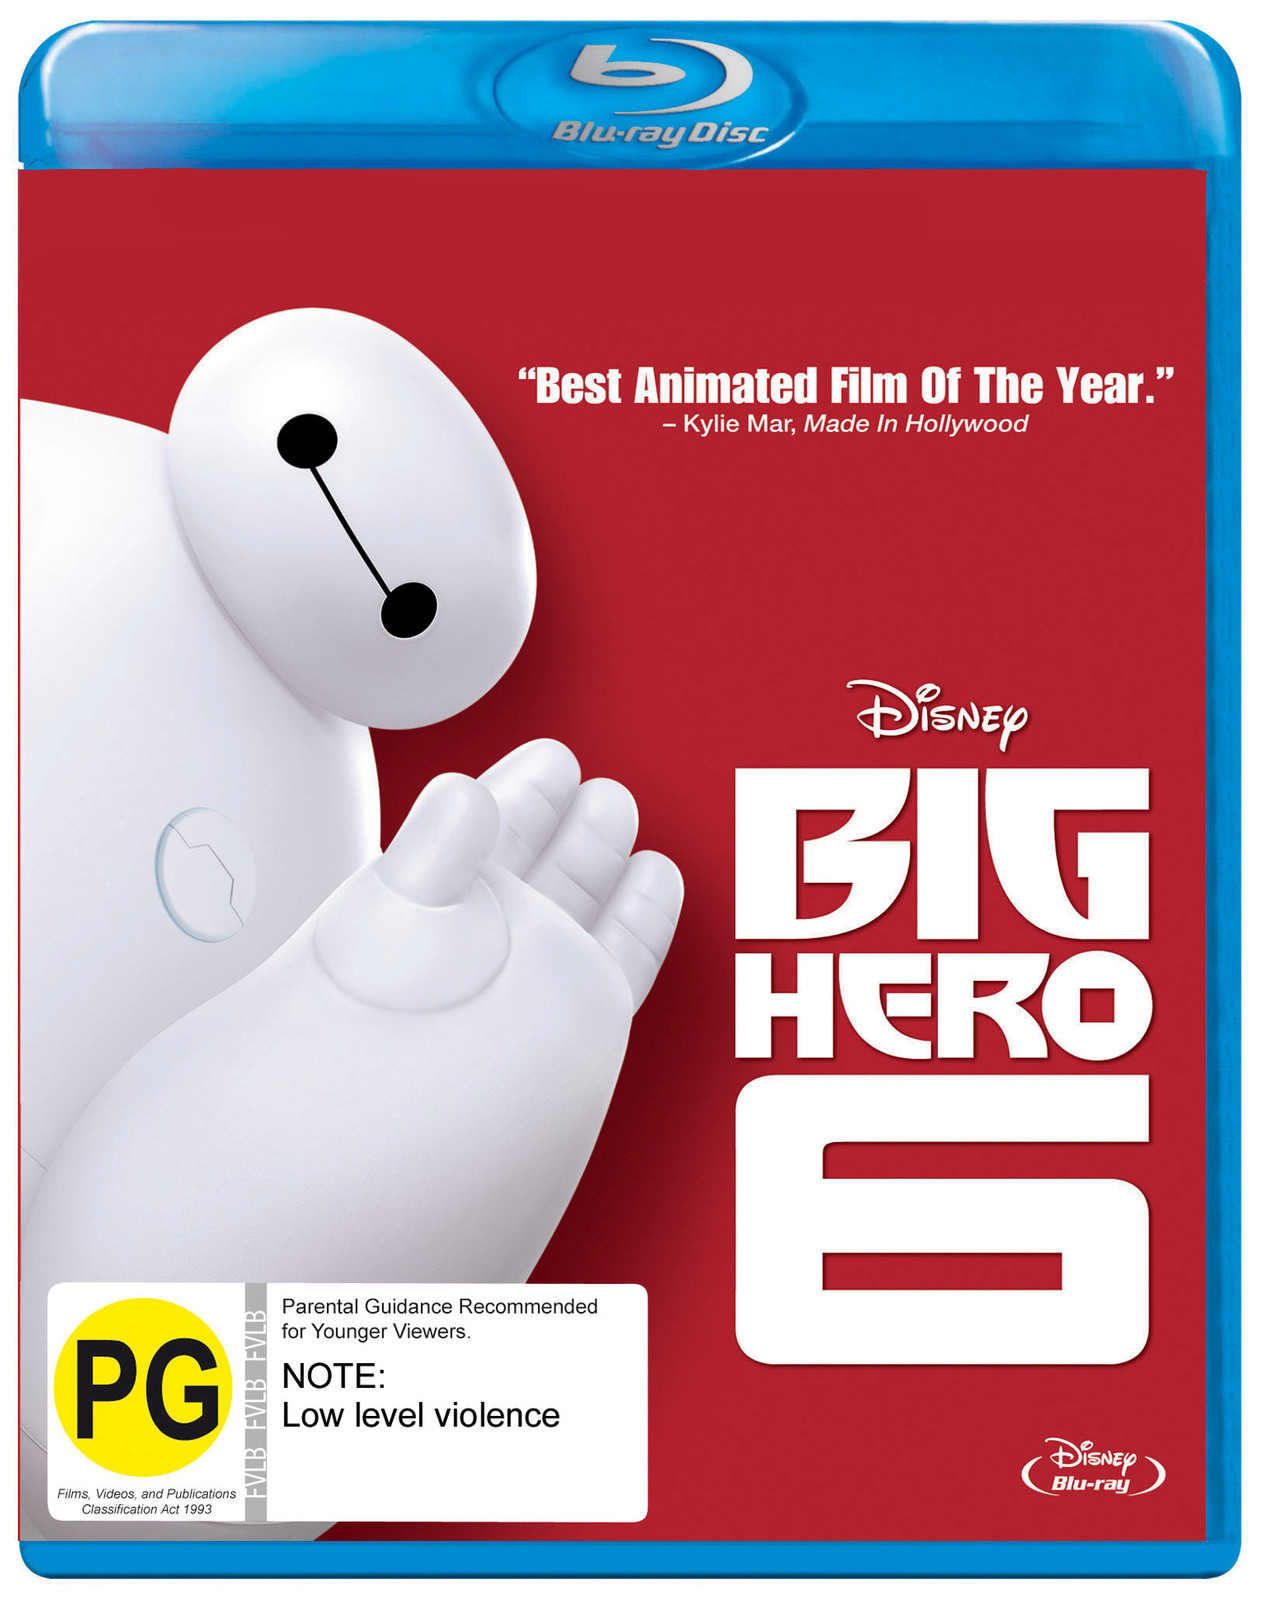 Big Hero 6 on Blu-ray image